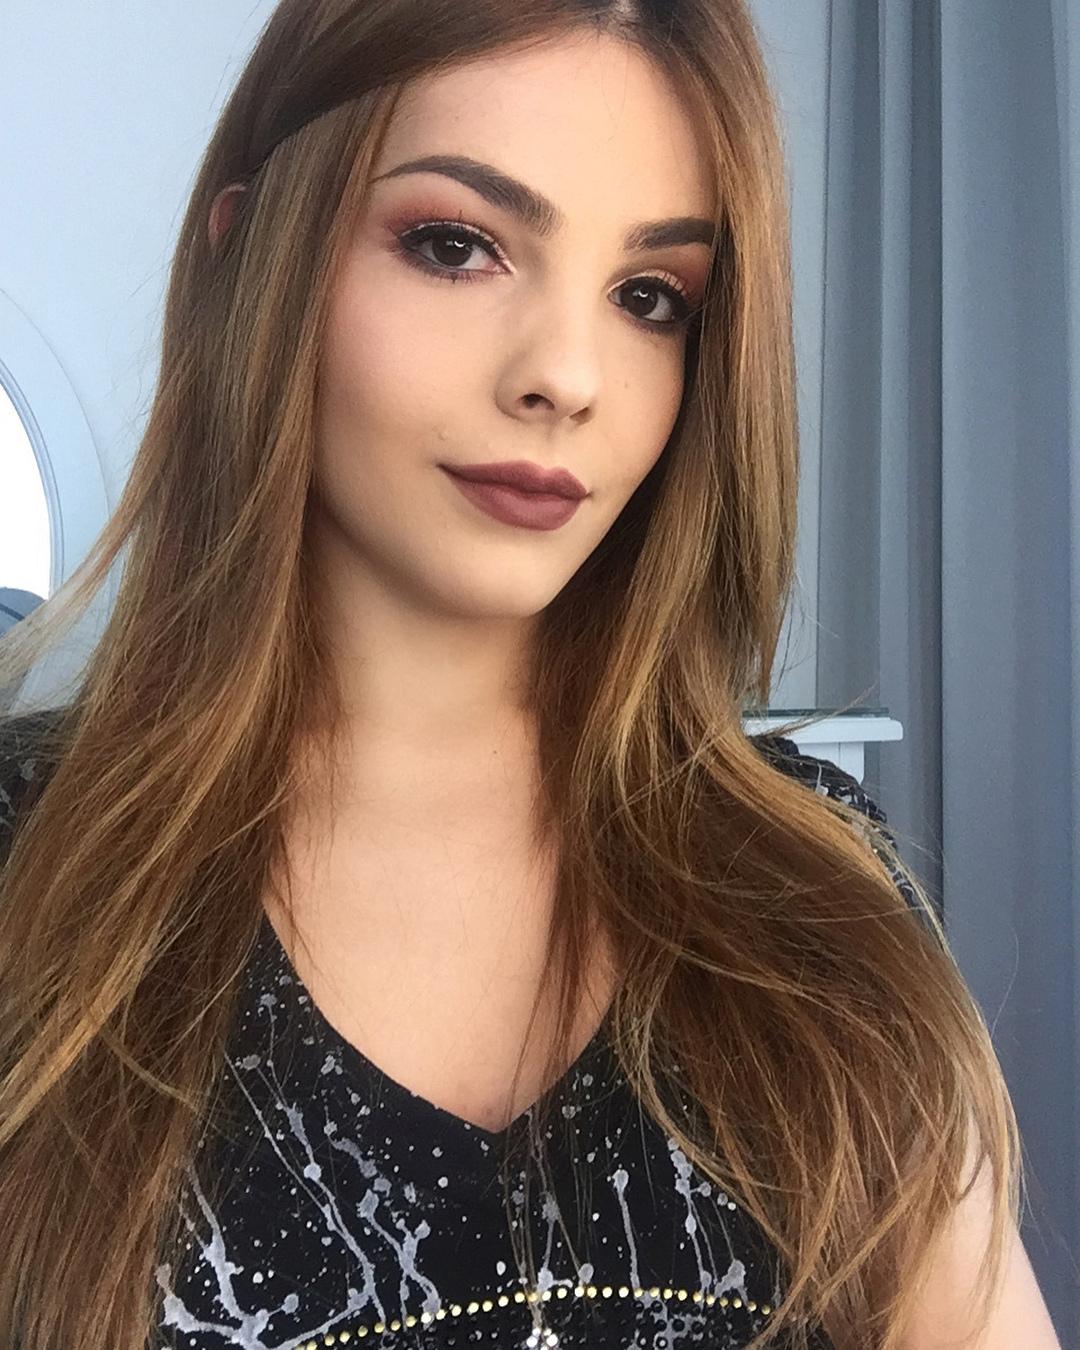 nathalie de oliveira, miss bom jardim 2019/1st runner-up de miss international queen 2016. - Página 3 36868510